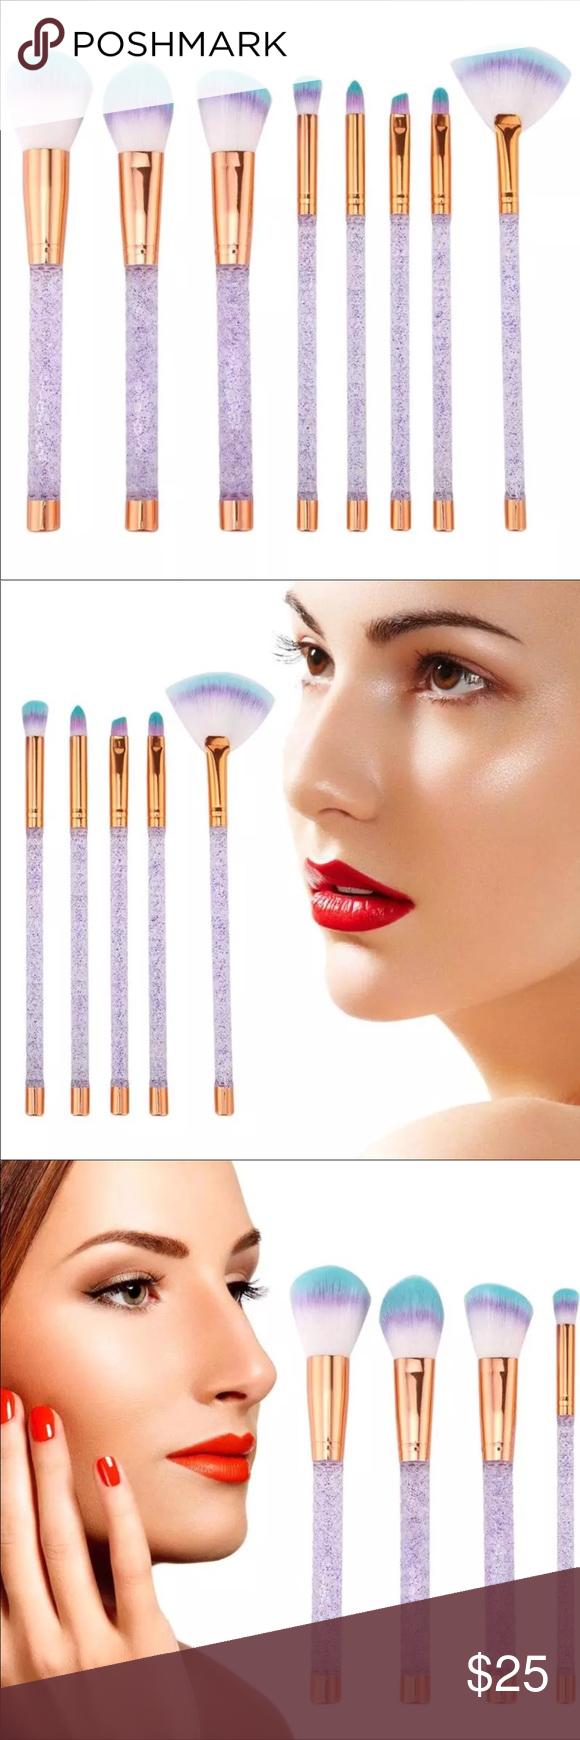 Pastel /purple glitter makeup brush set Purple glitter